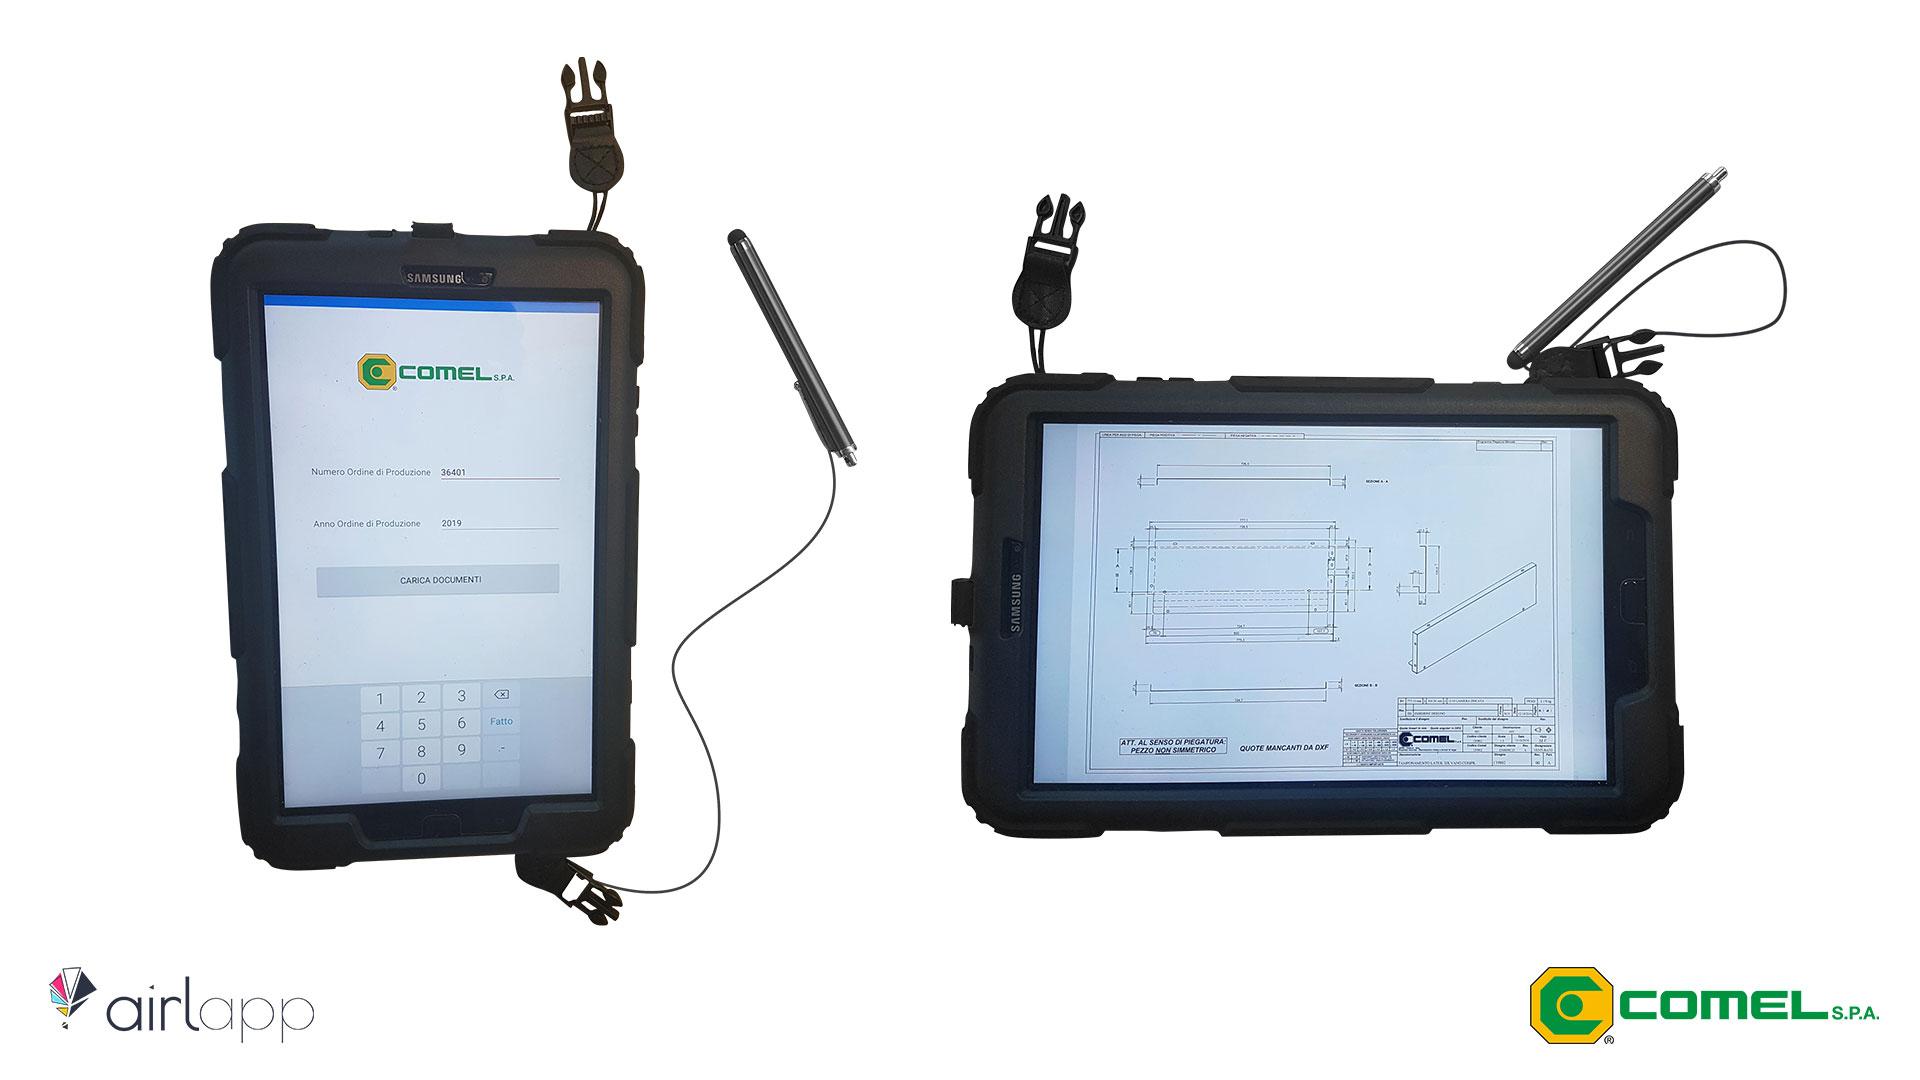 Tablet completi per Comel - Paperless - Airlapp